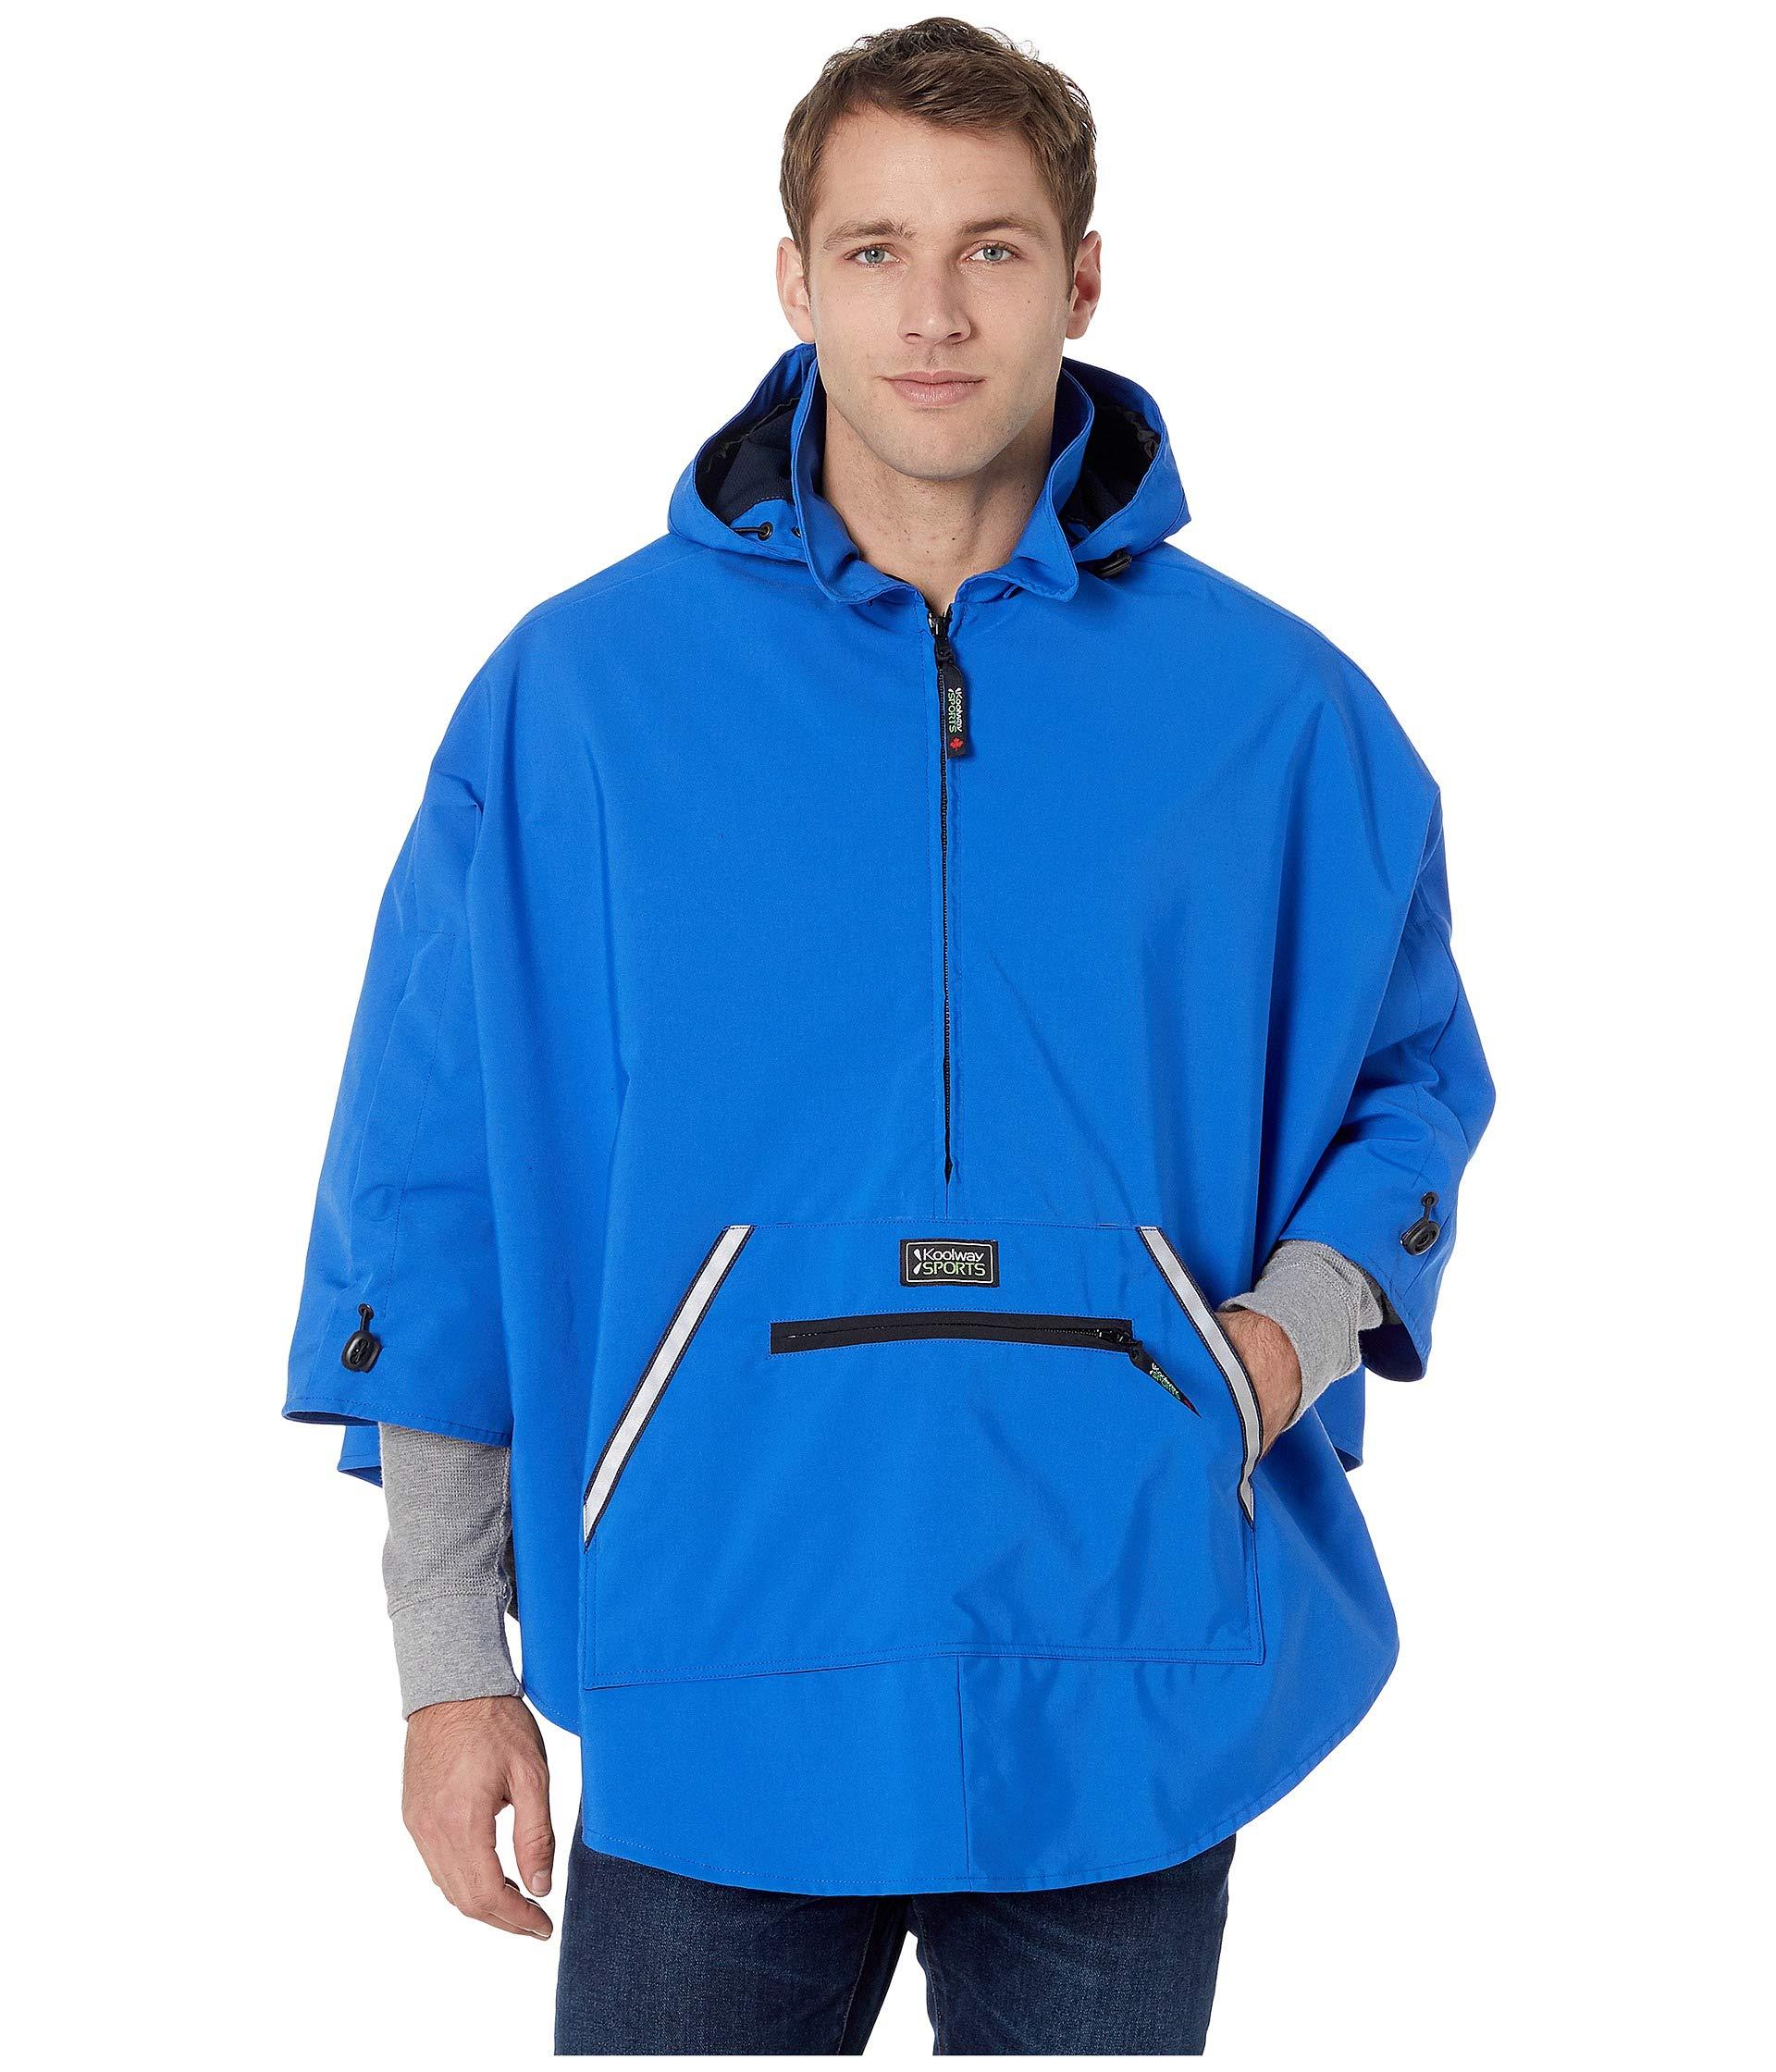 Sports Removable Fleece Royal And 0 Lining 2 Koolkapes Koolway AwzCfqC